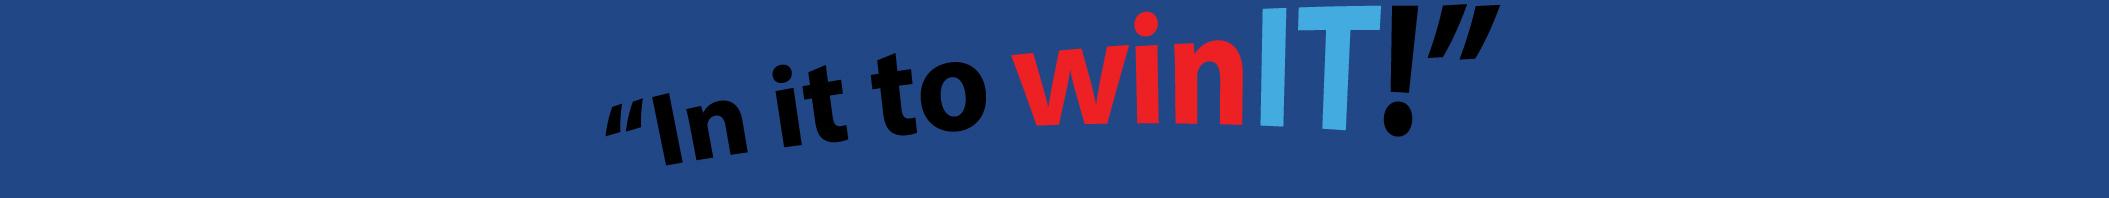 InItToWinIT_WidePanel.jpg